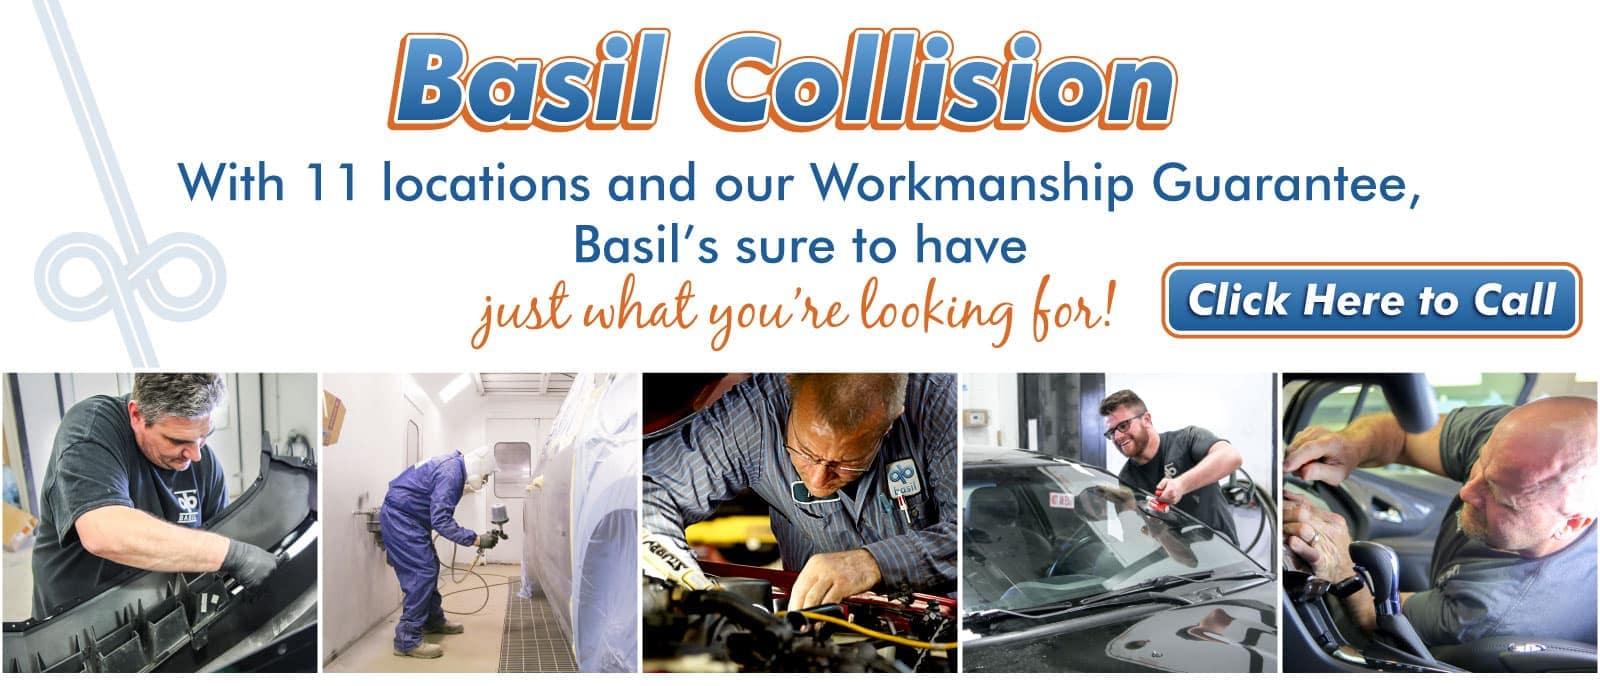 Basil Collision